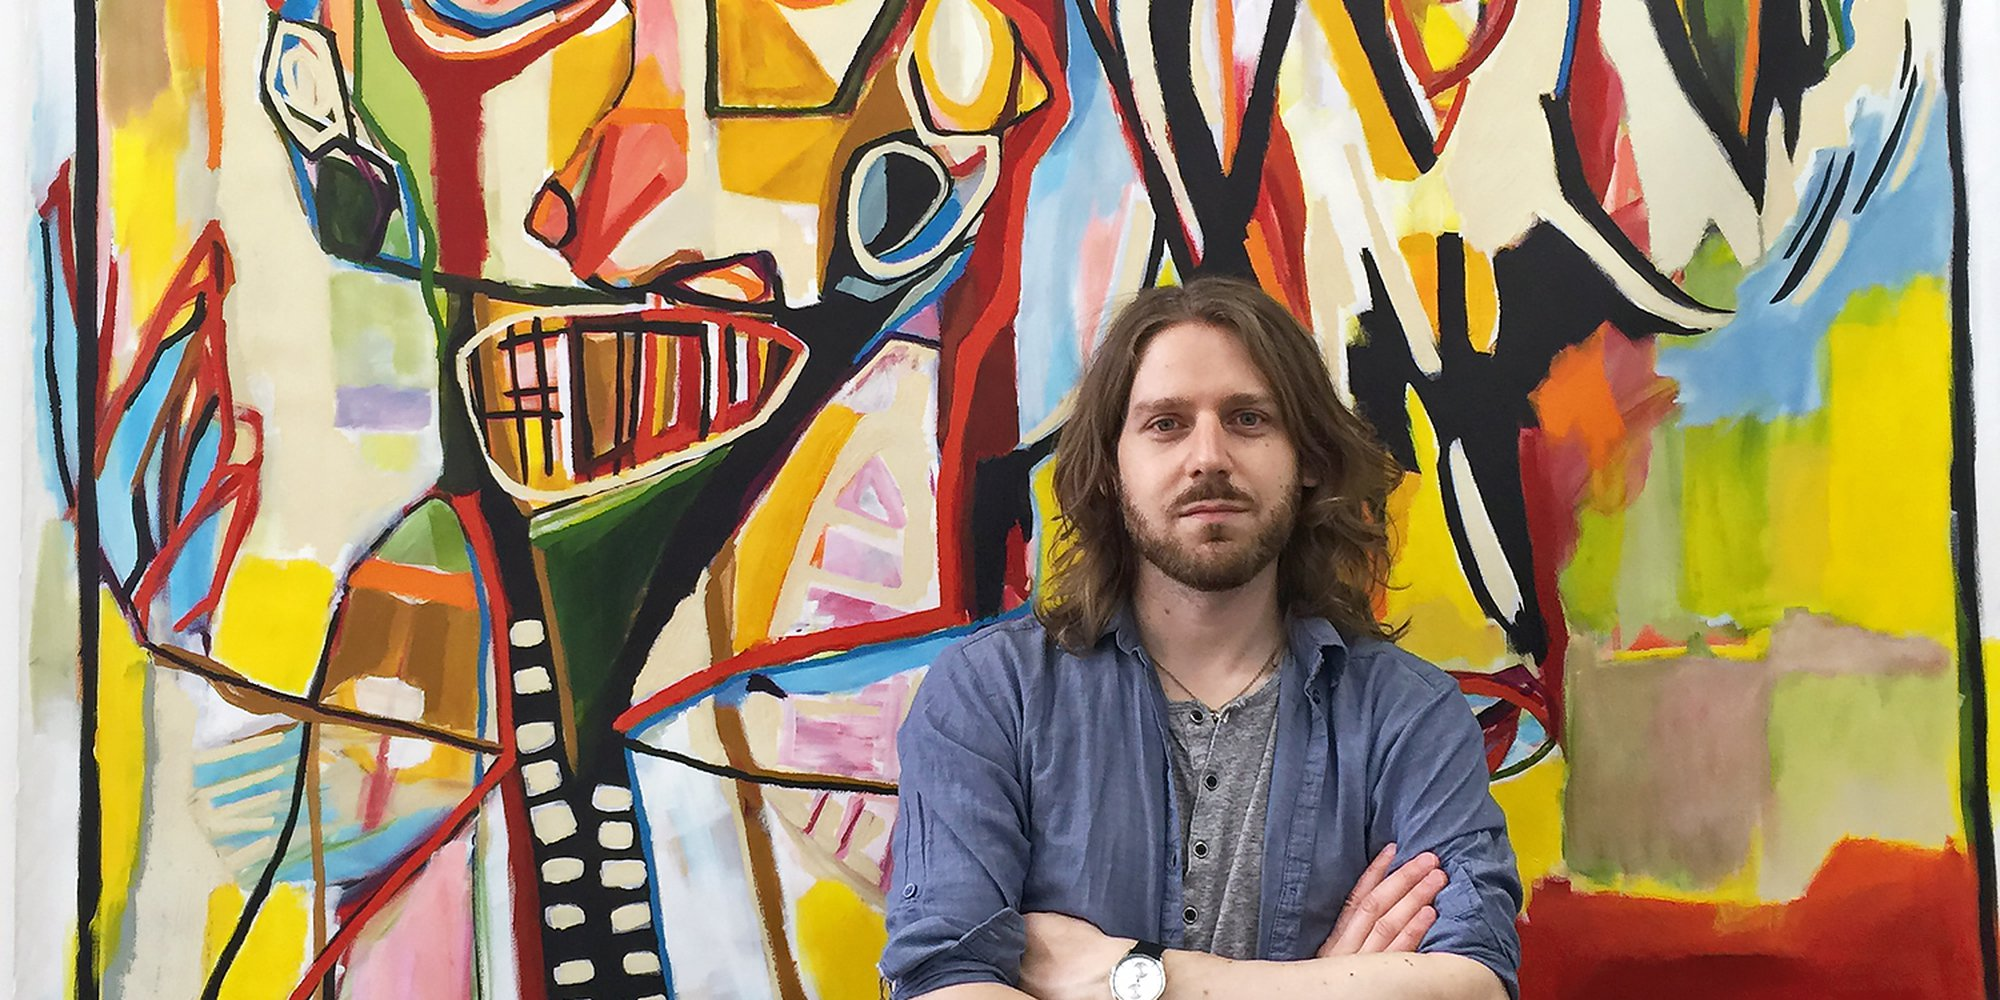 Artfinder Artist Reinder Oldenburger talks Van Gogh, music and his move from Amsterdam to NYC.